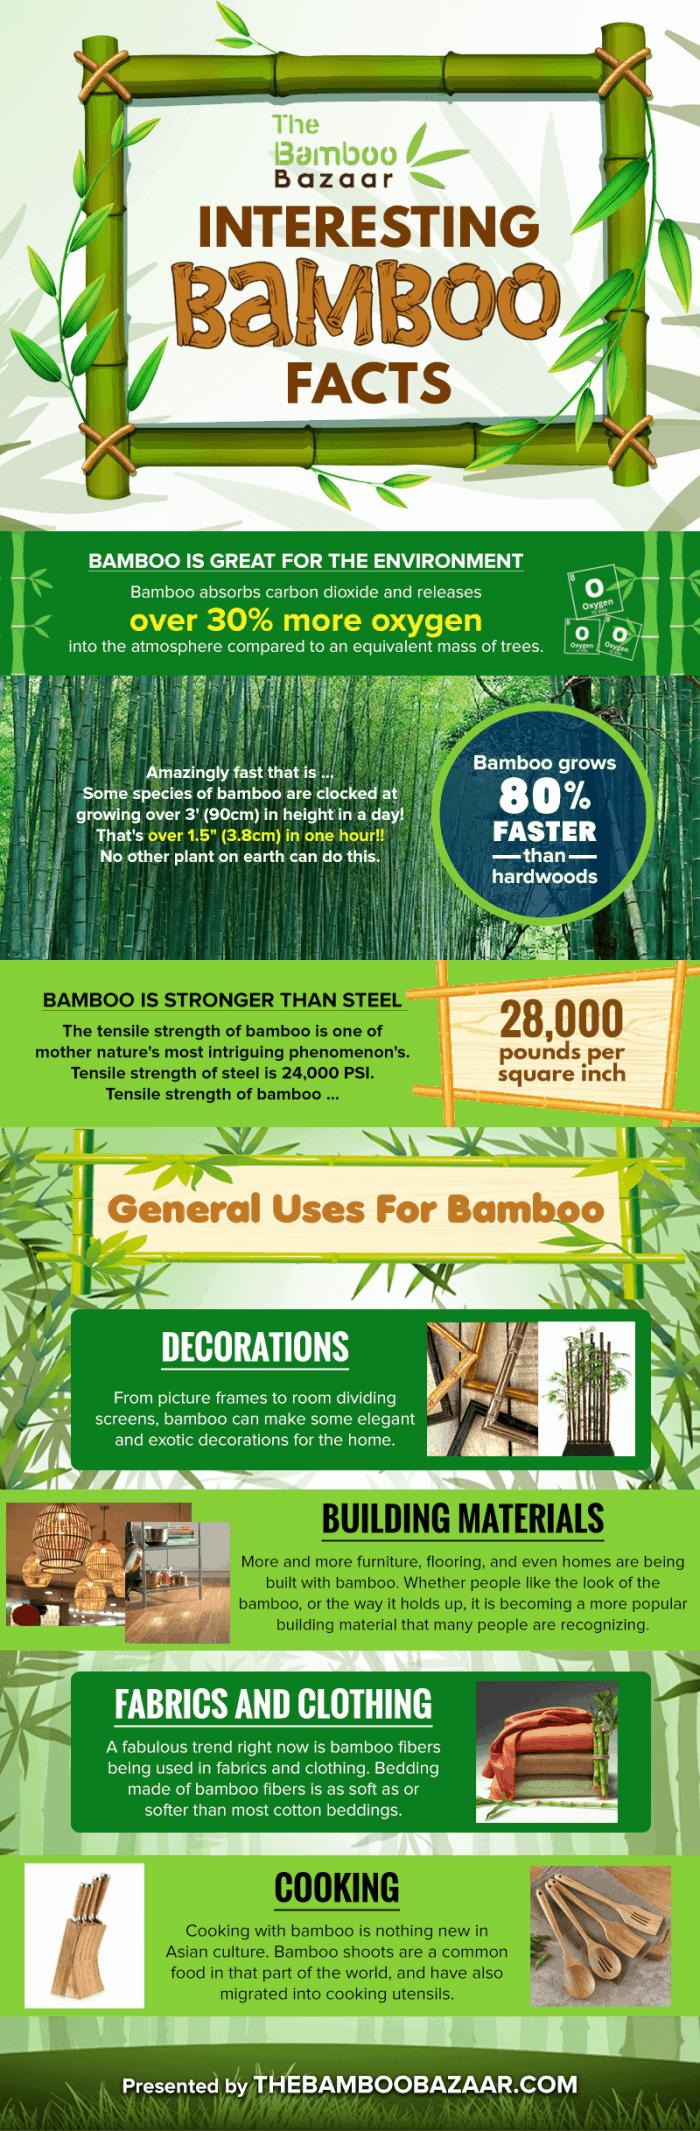 amazing bamboo facts